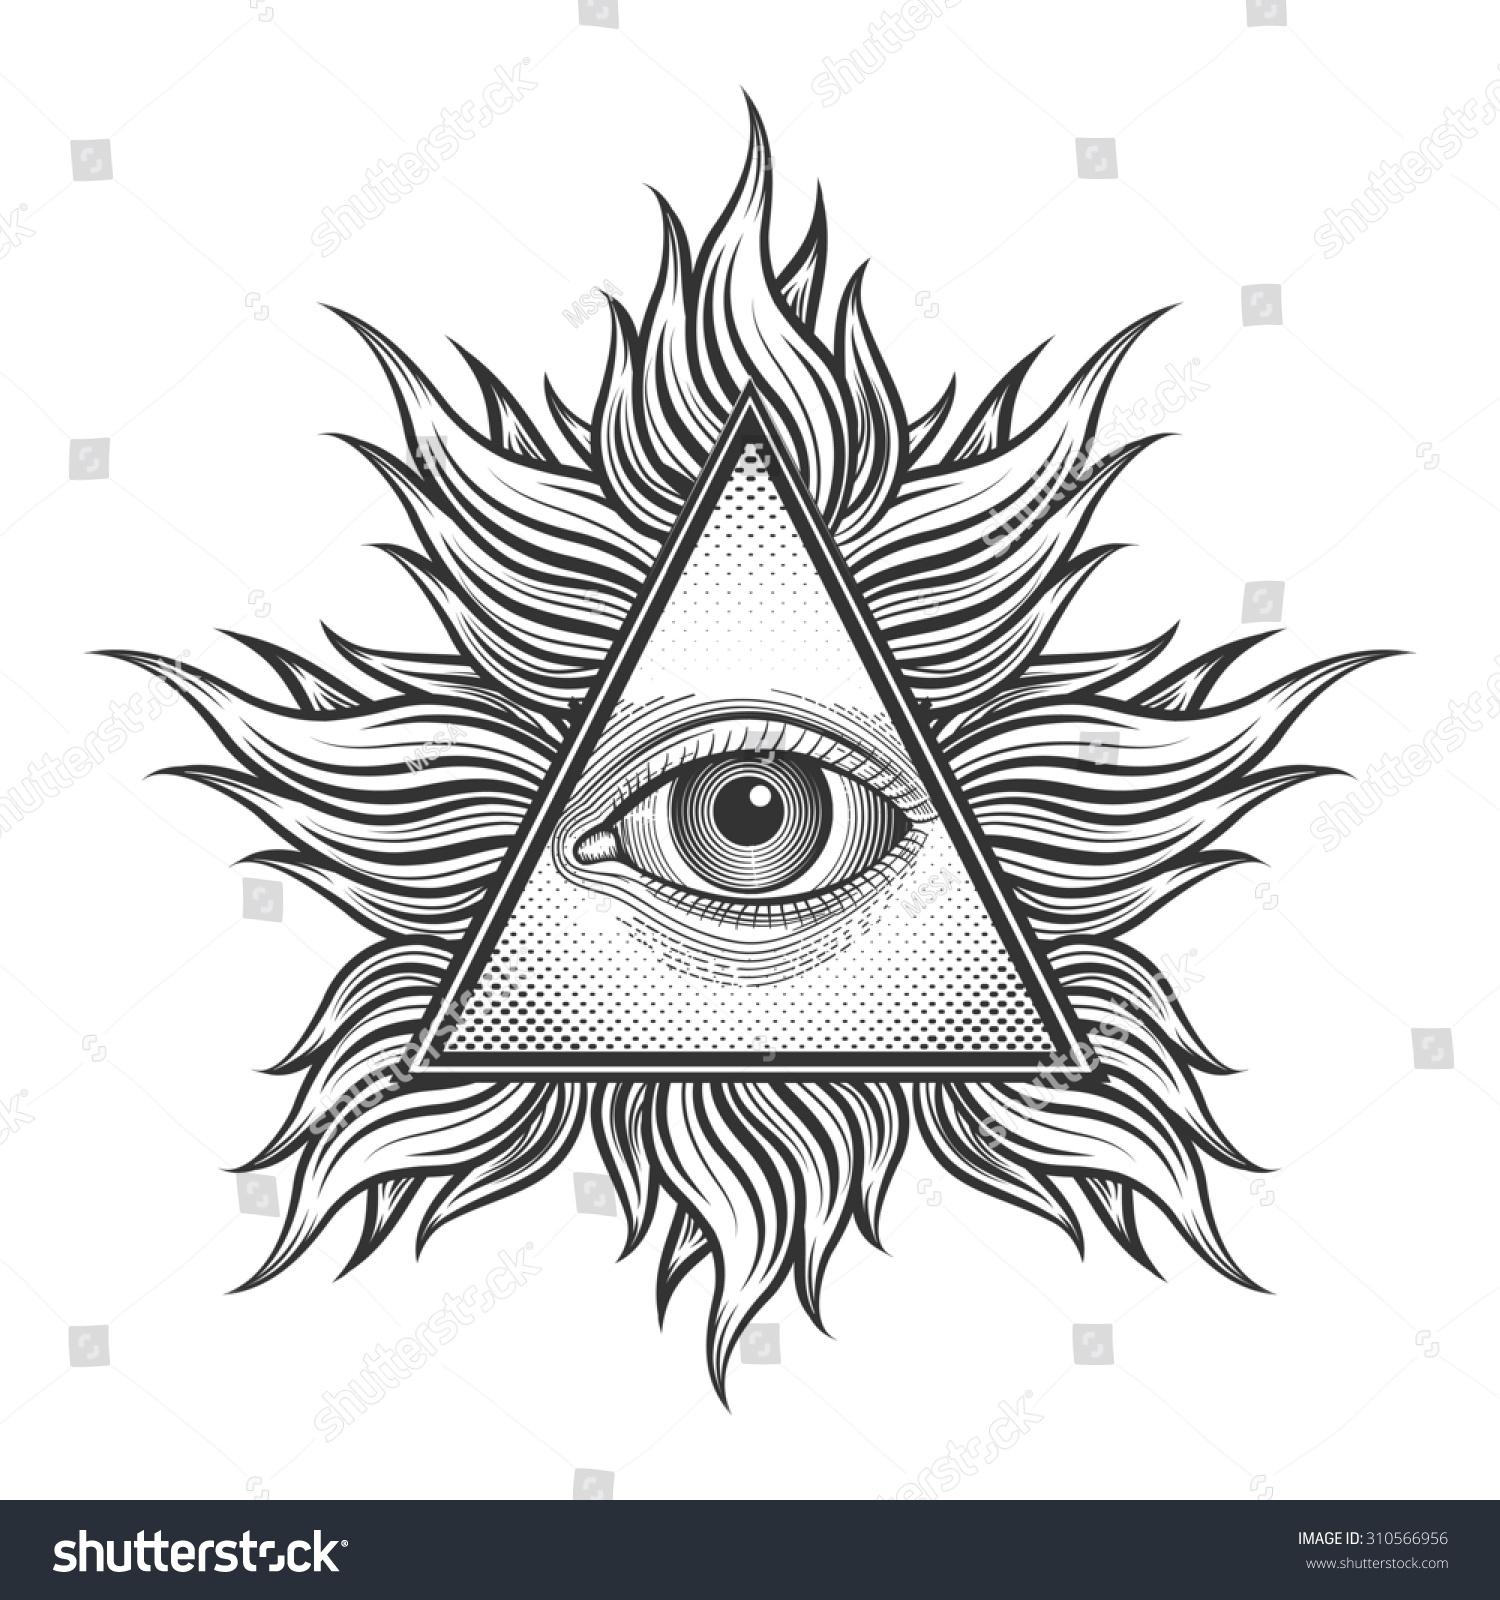 All Seeing Eye Pyramid Symbol Engraving Stock Illustration 310566956